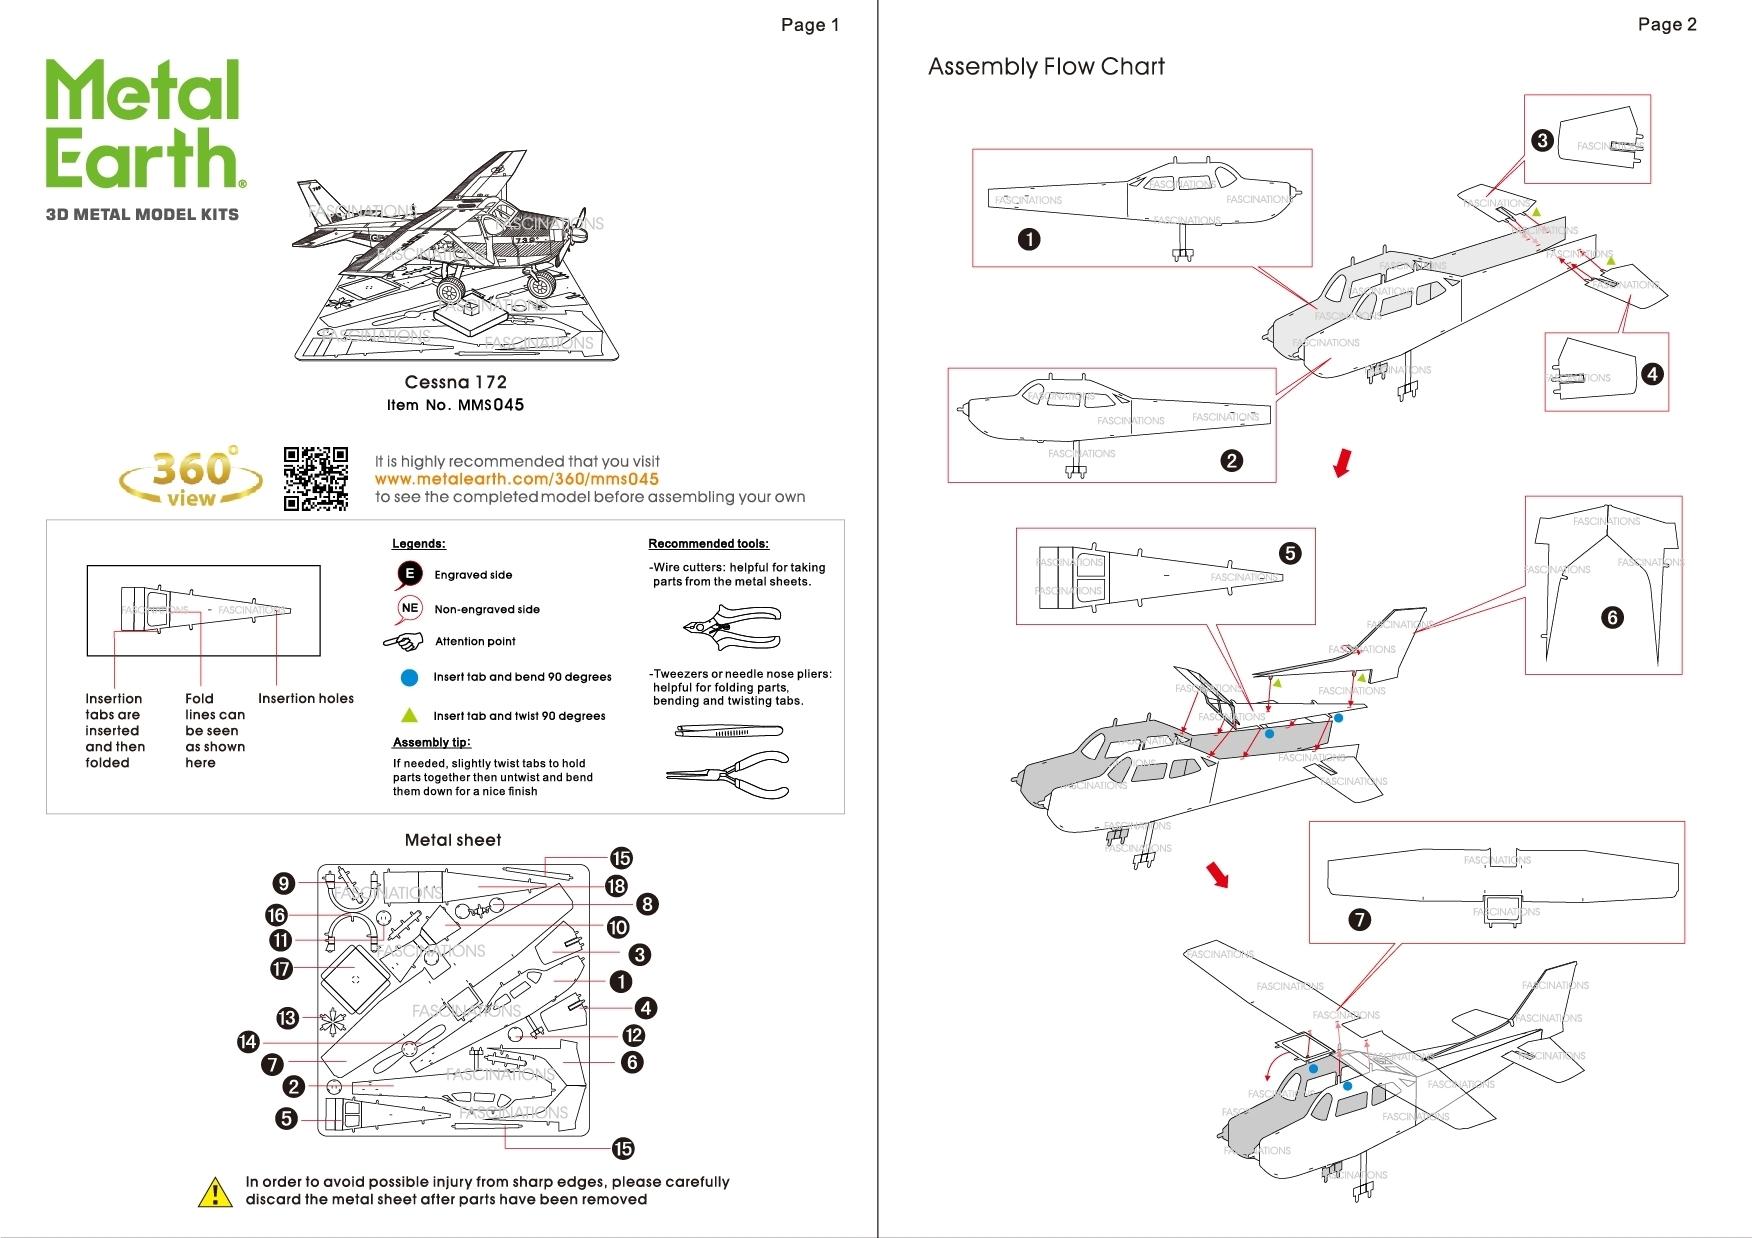 Aircraft Wiring Diagram Manual. Wiring. Wiring Diagram Images